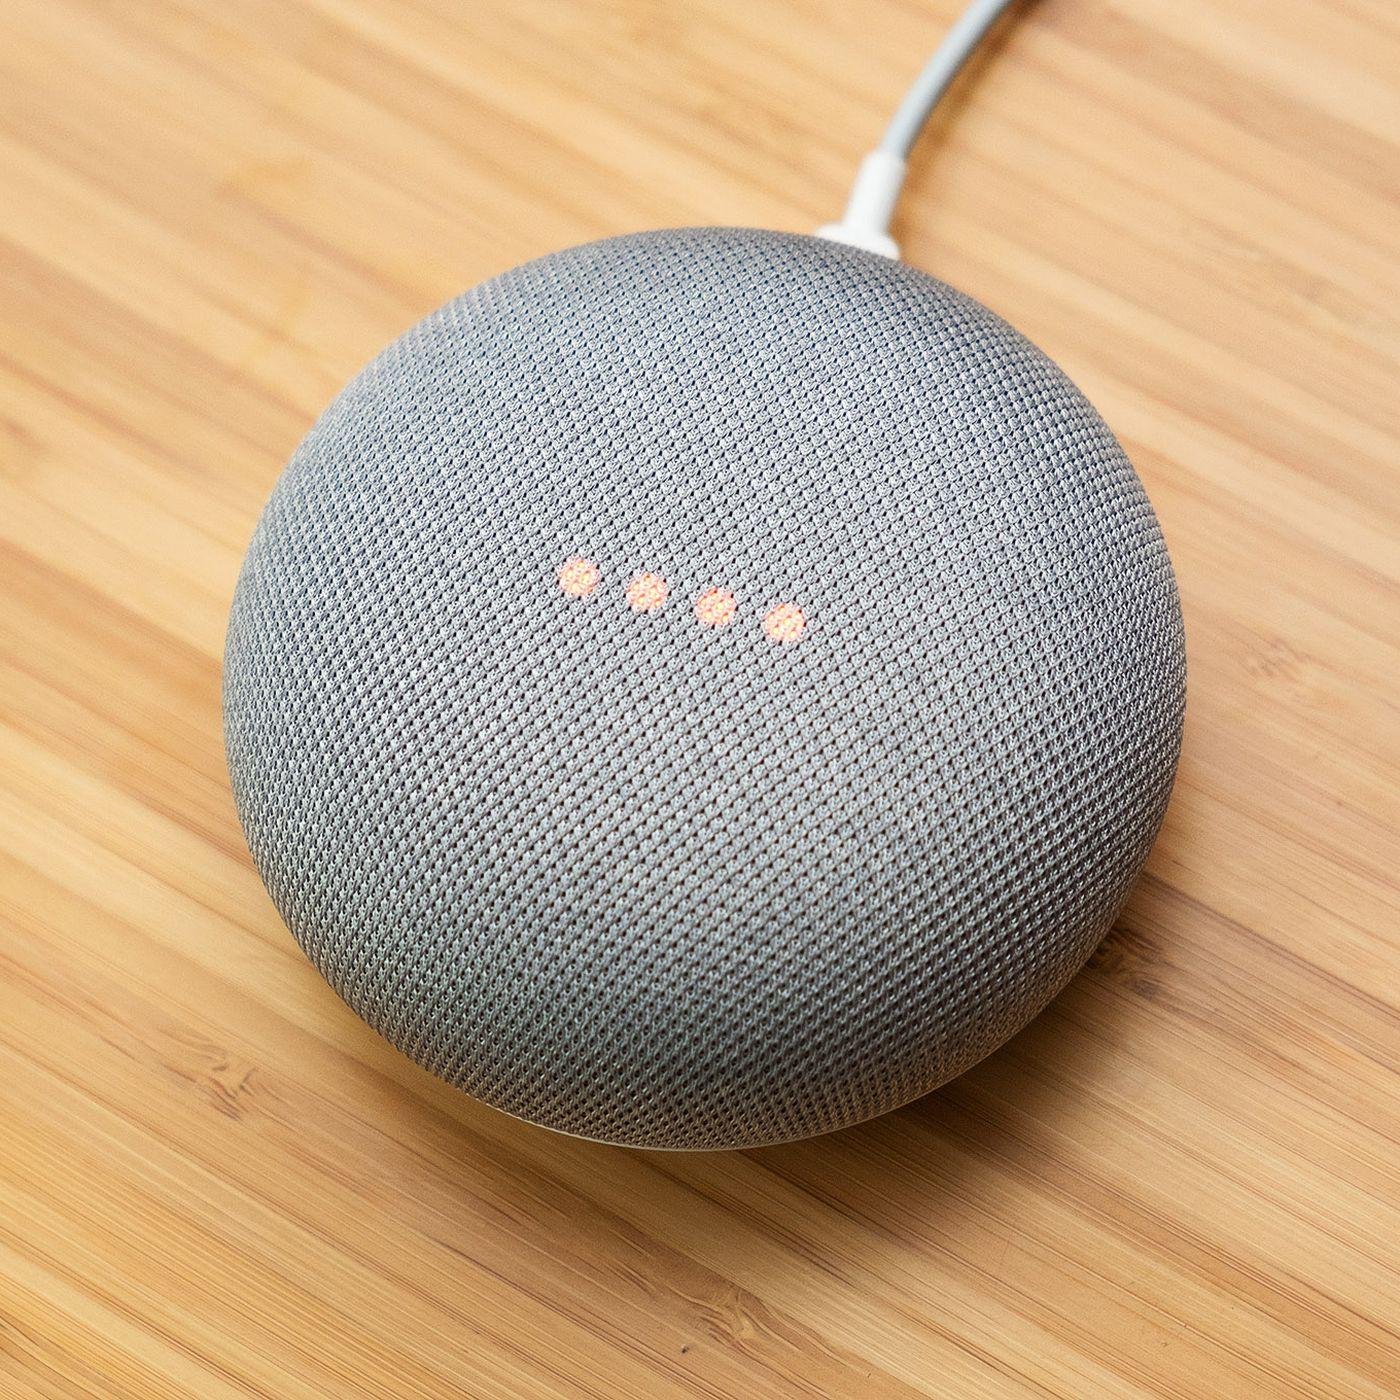 The Best Google Deals Of Black Friday 2017 Google Home Mini Chromecast Google Wifi The Verge